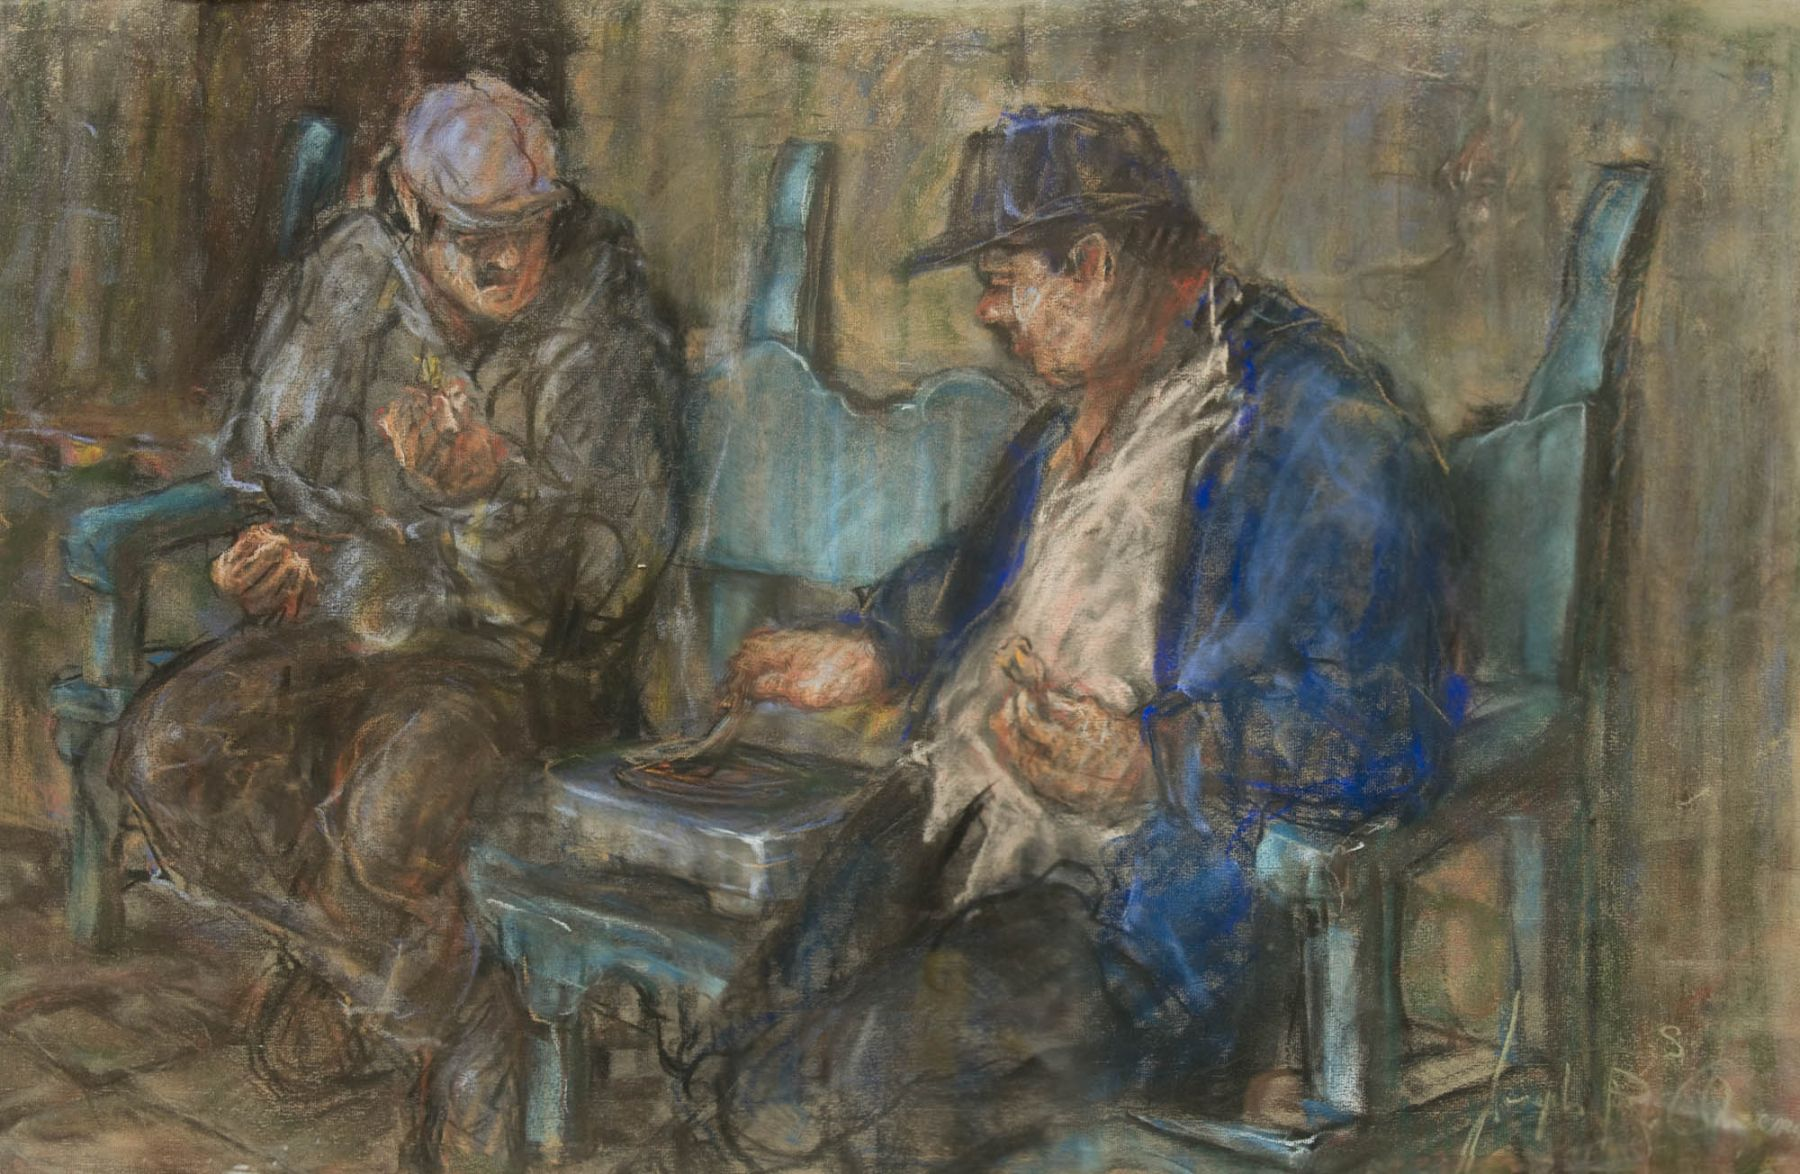 Joseph Areno, Working on Casa de la Guerra, c. 1997